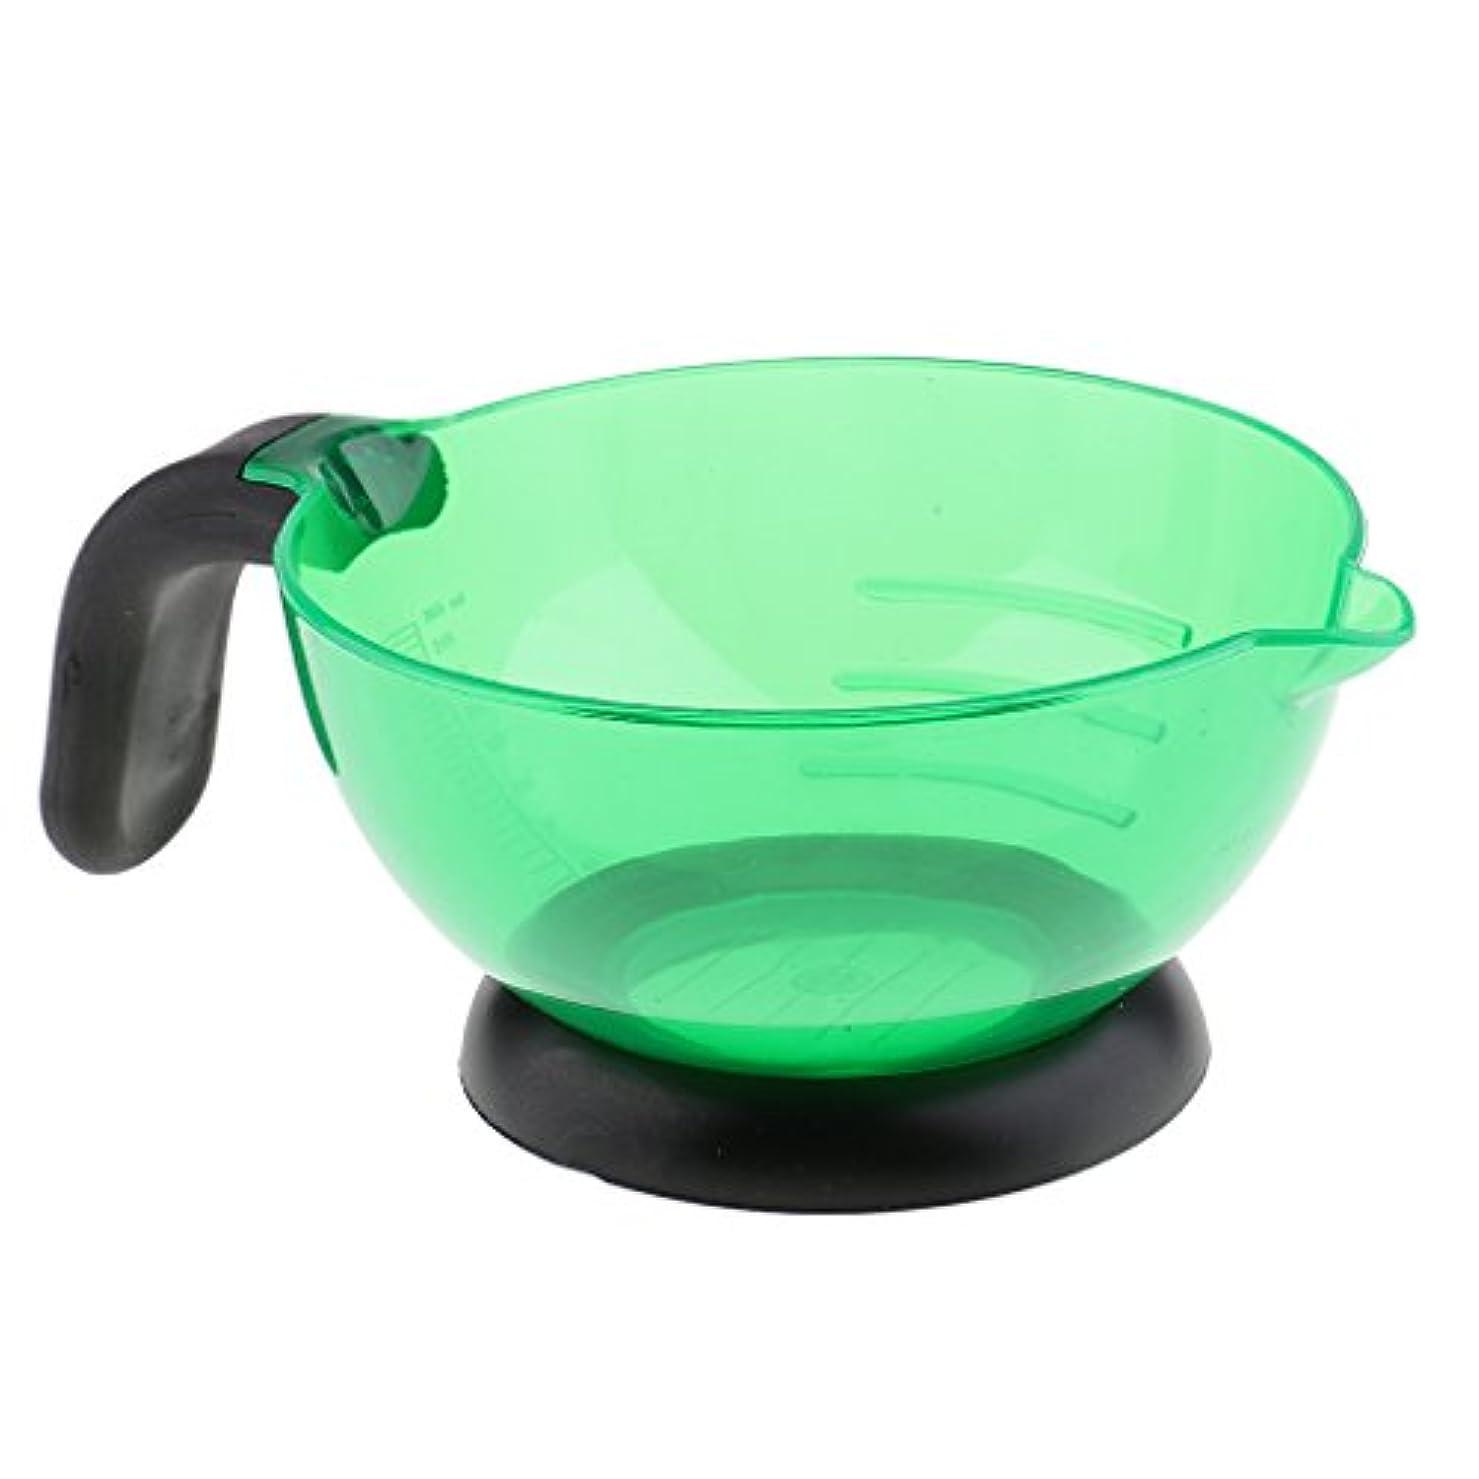 Perfeclan ヘアカラー 染め用具 美容室/サロン 染剤ボウル 調和用ボウル シリコン製 滑り止め 全3色 - 緑